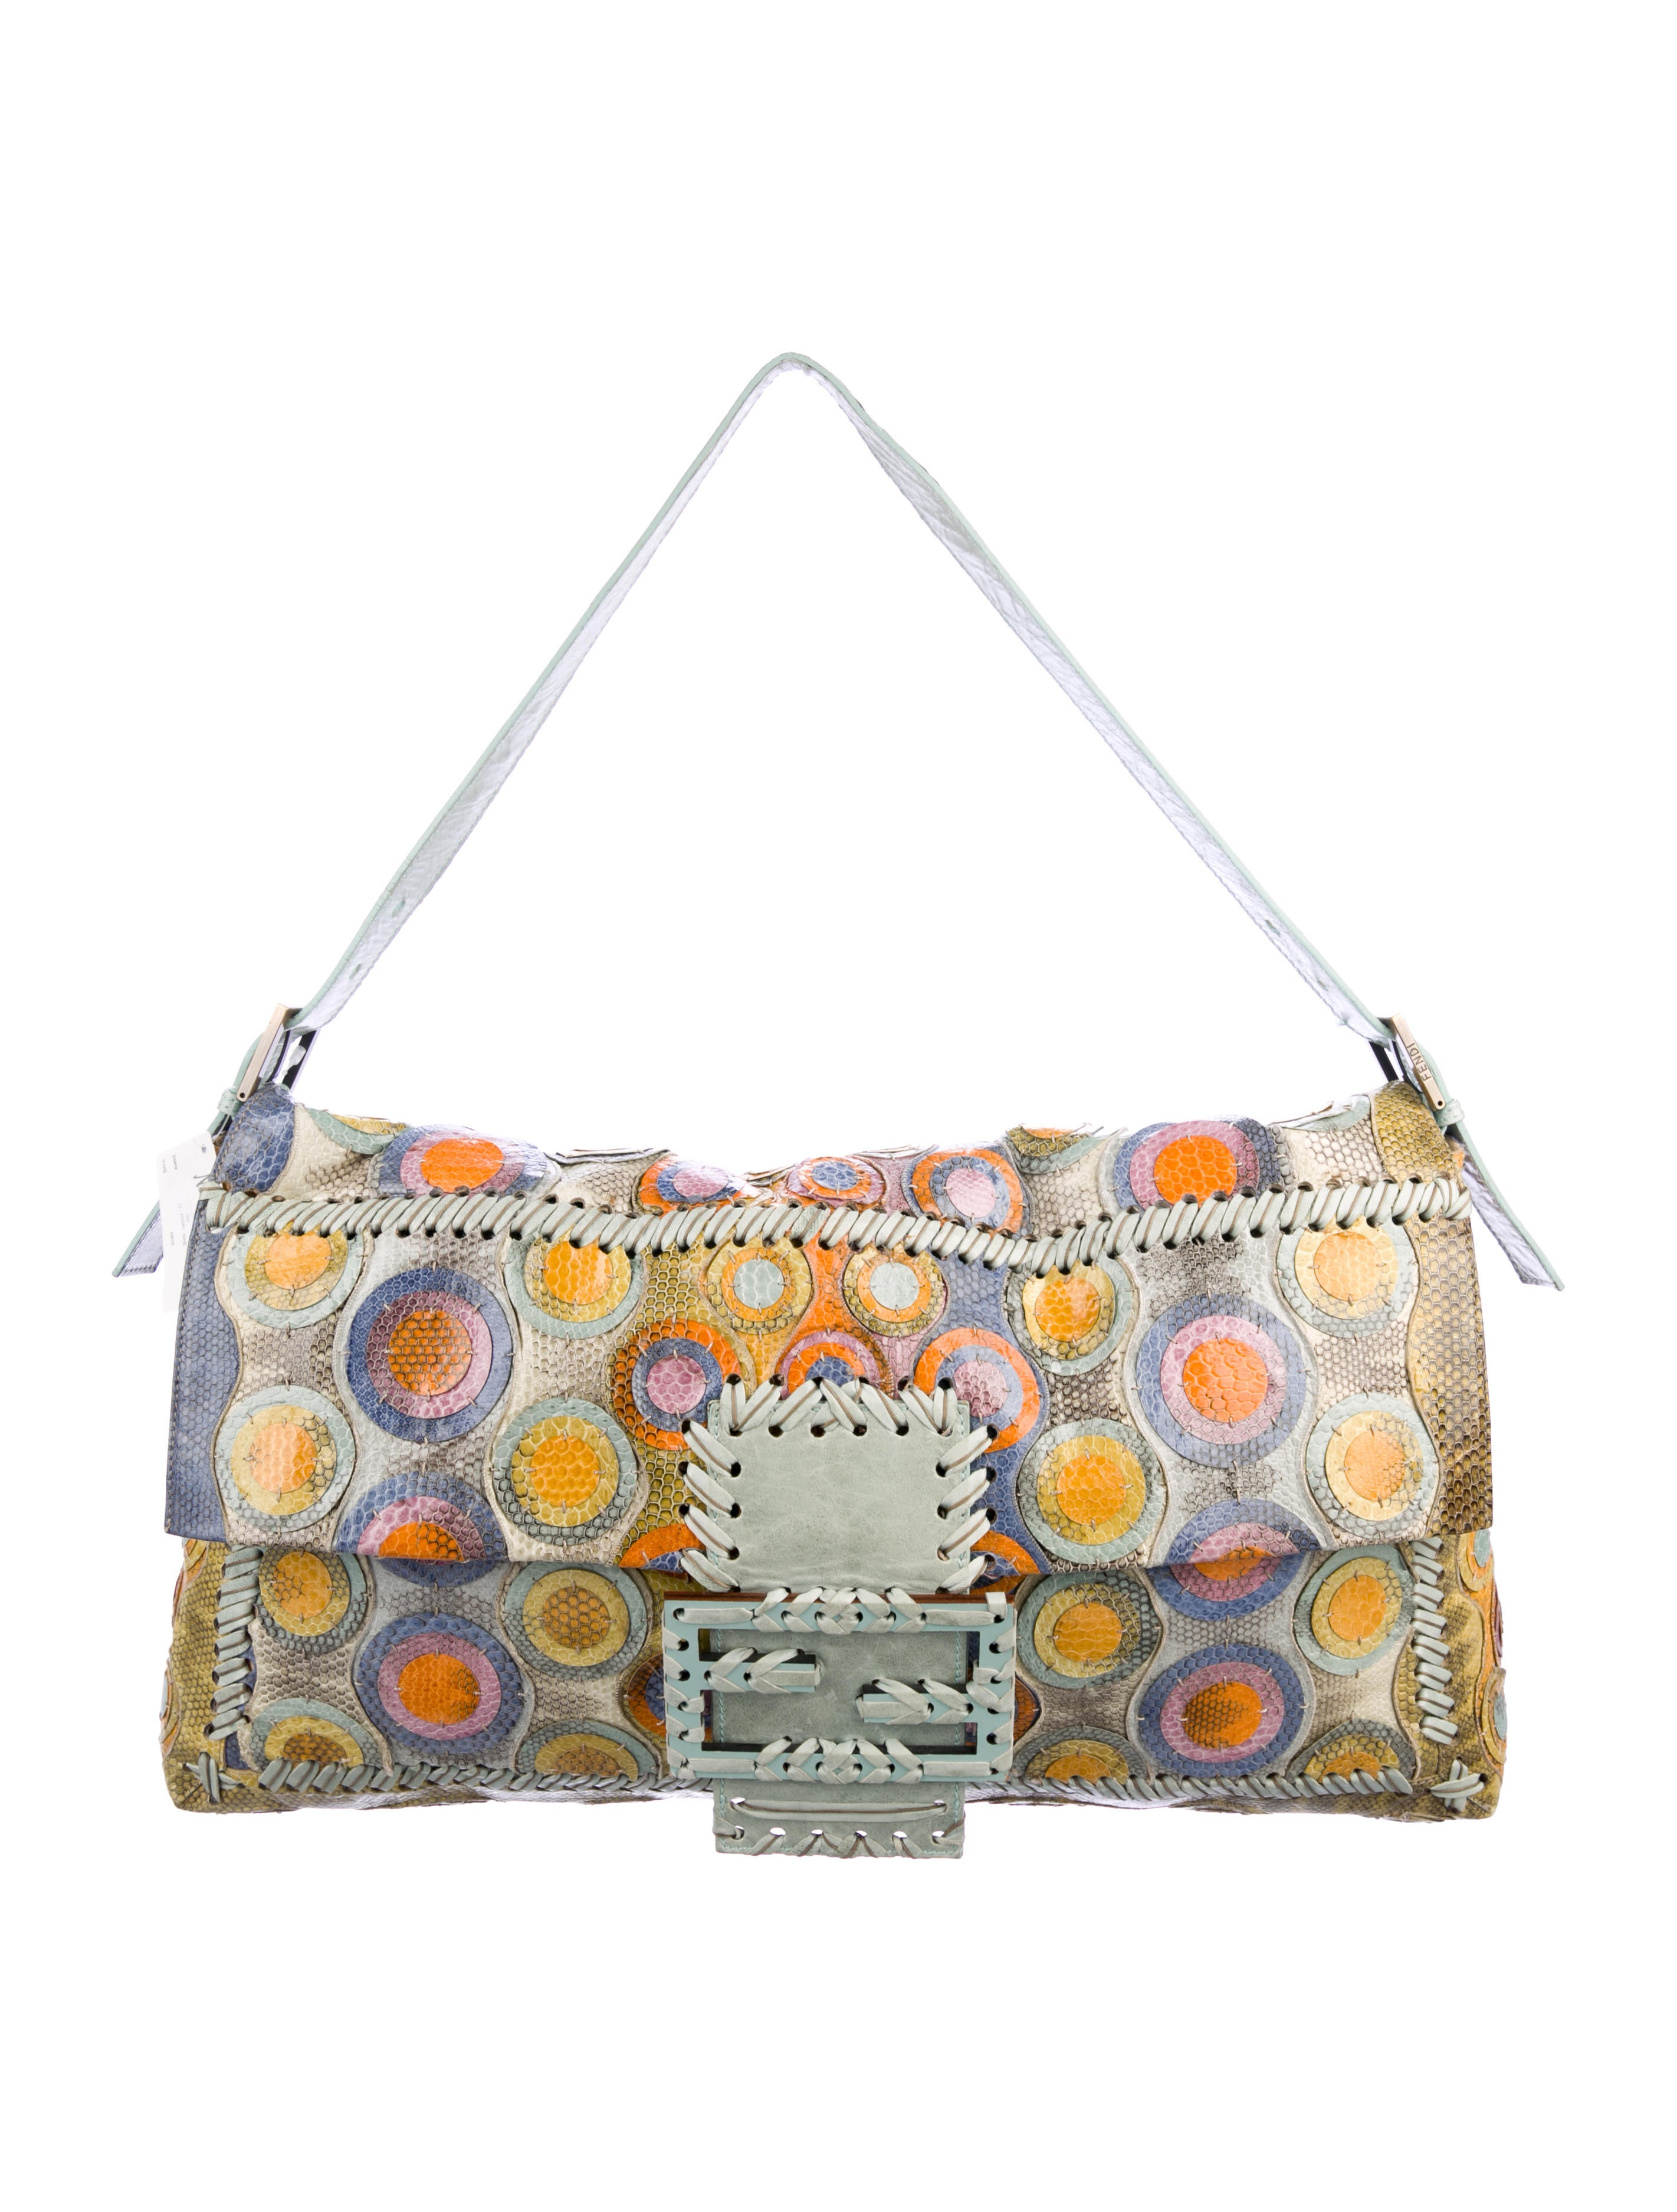 8142ddafc9e2 Fendi Maxi Snakeskin Baguette - Handbags - FEN94674